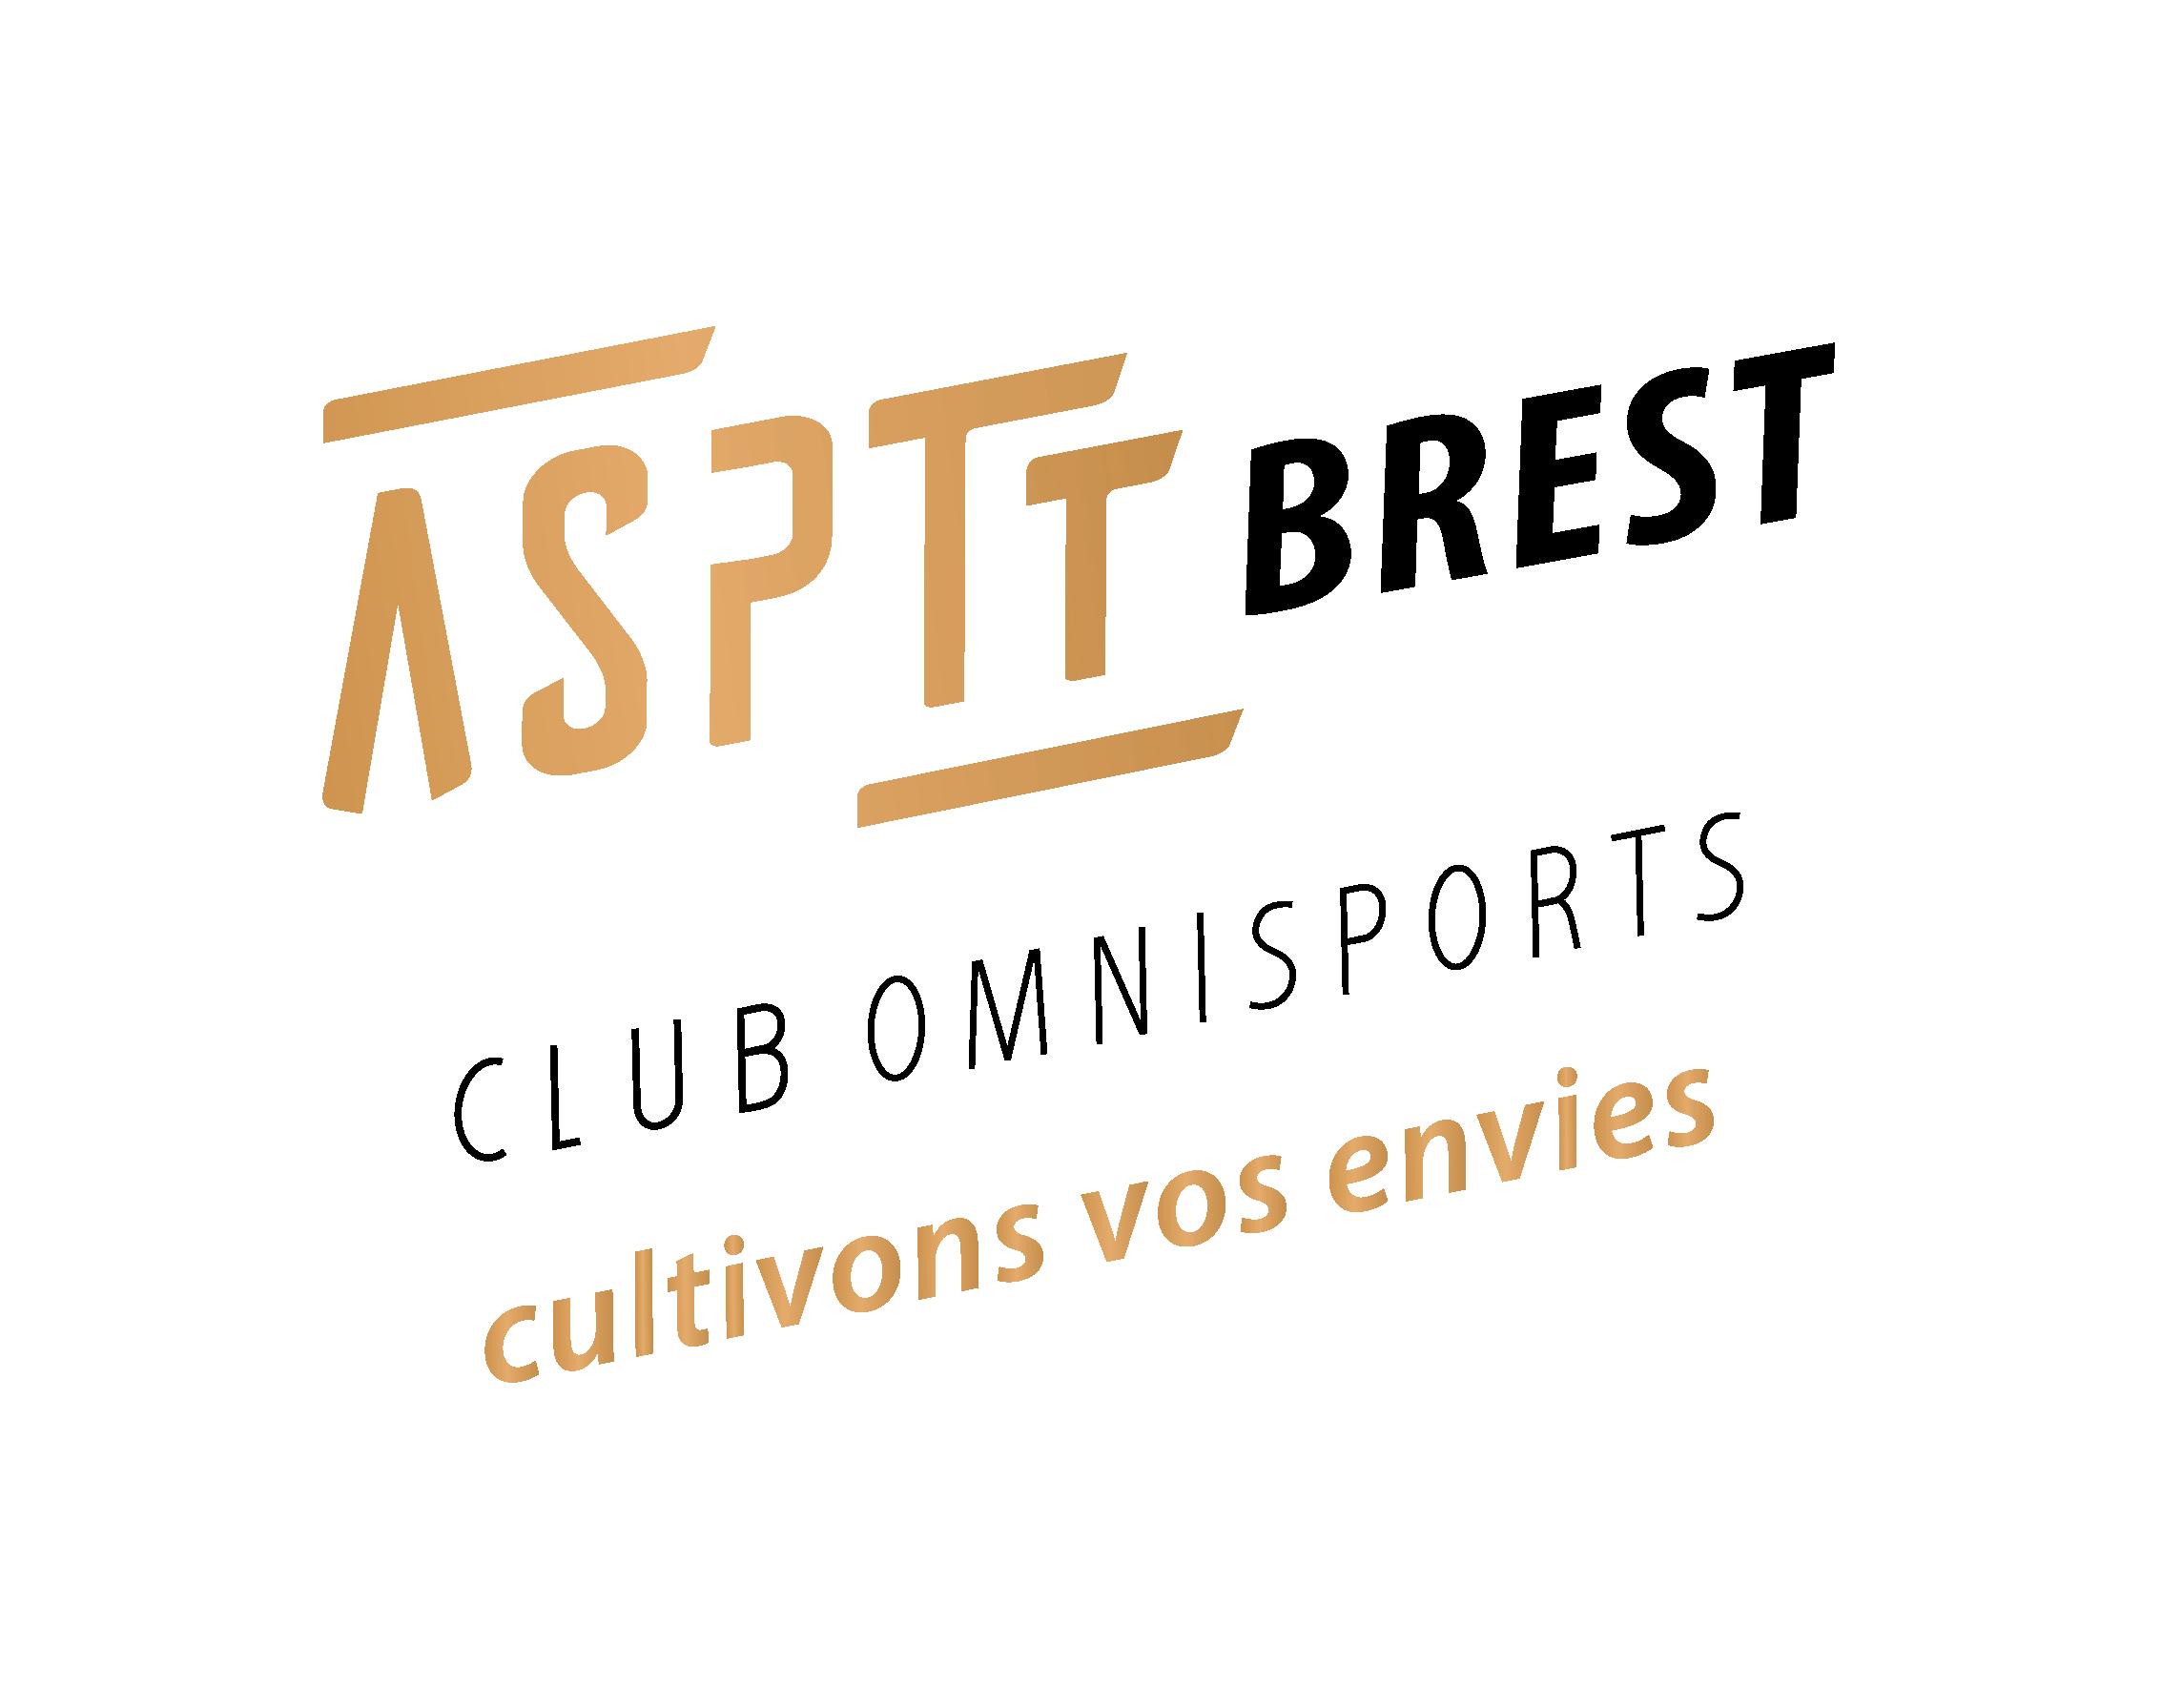 Un club - 18 activités - A l'ASPTT BREST  Cultivons vos envies